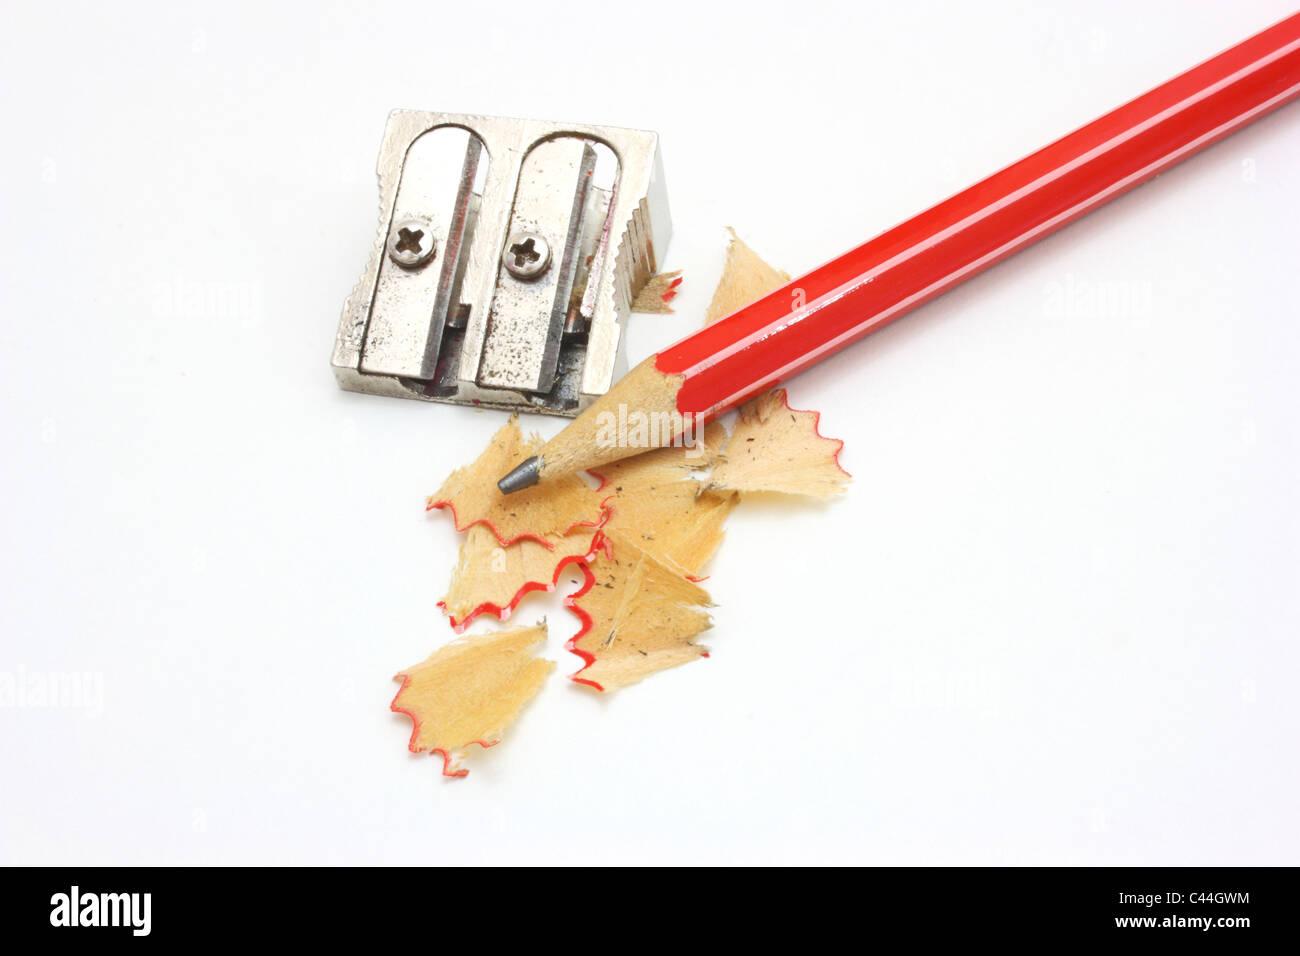 Shot Of Eraser Pencil And Pencil Metal Double Sharpener